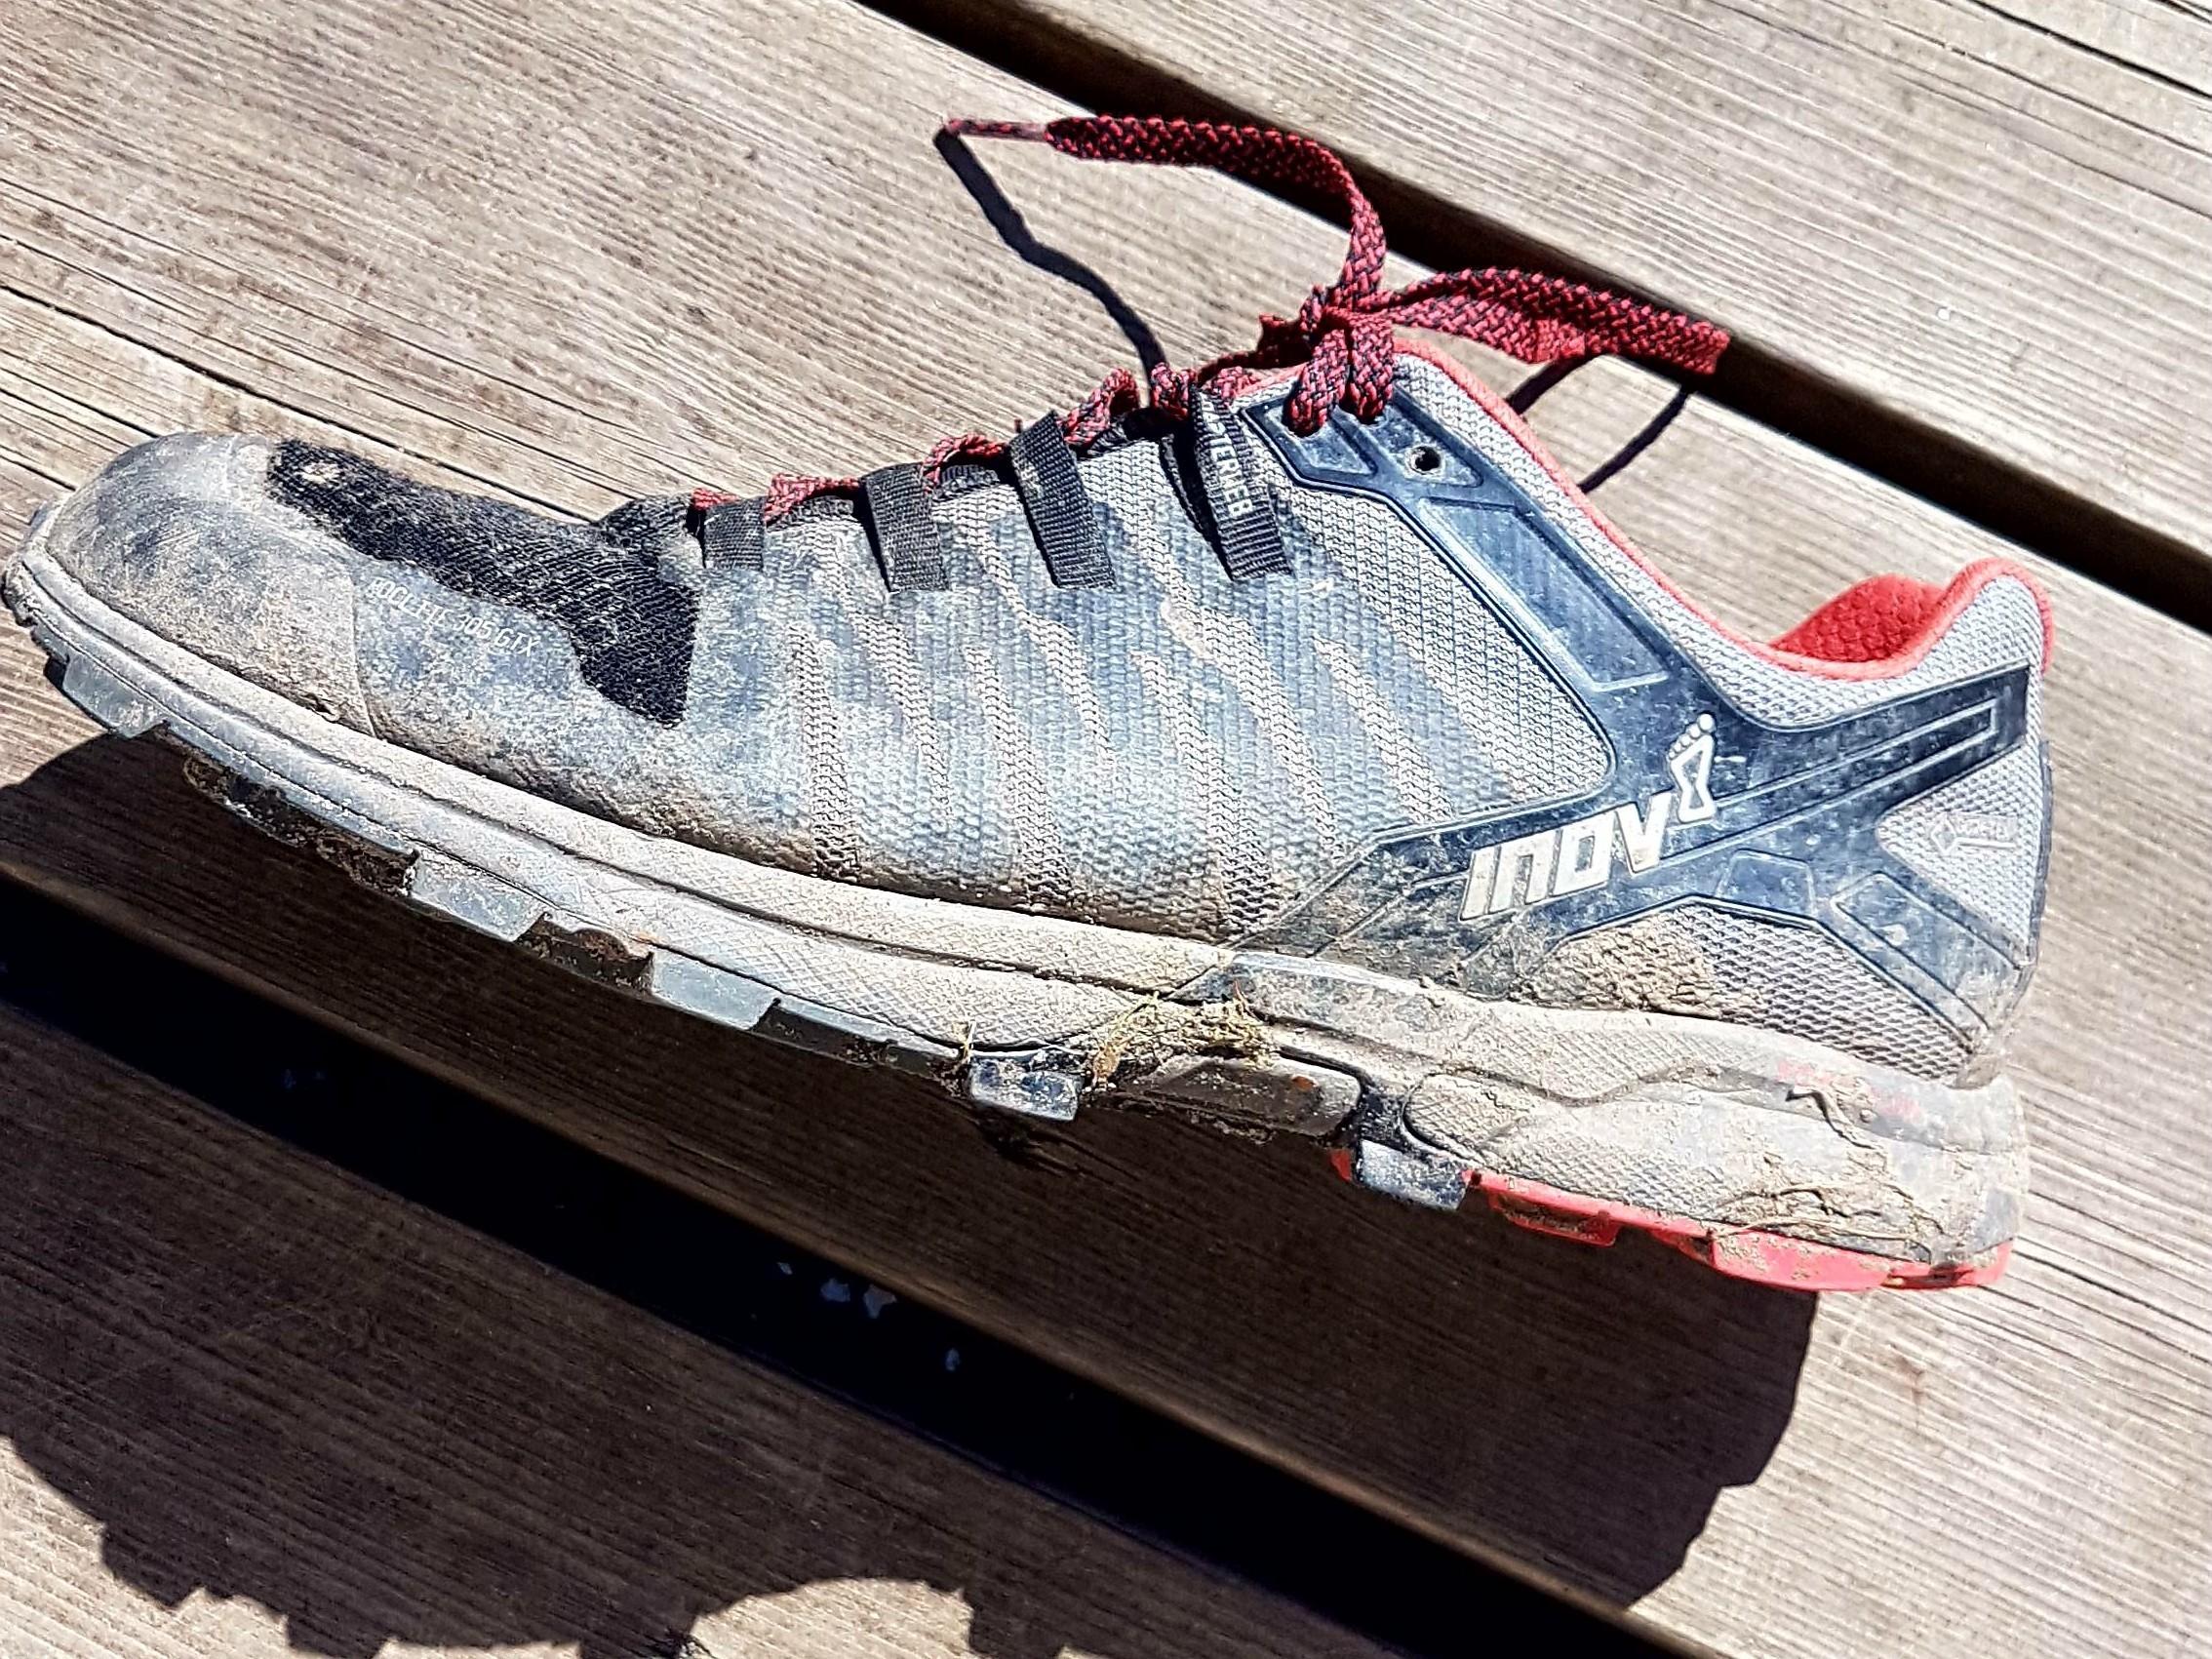 half off b11e2 0e34e Review: Inov-8 Roclite 305 GTX Trail running shoes - GearLimits